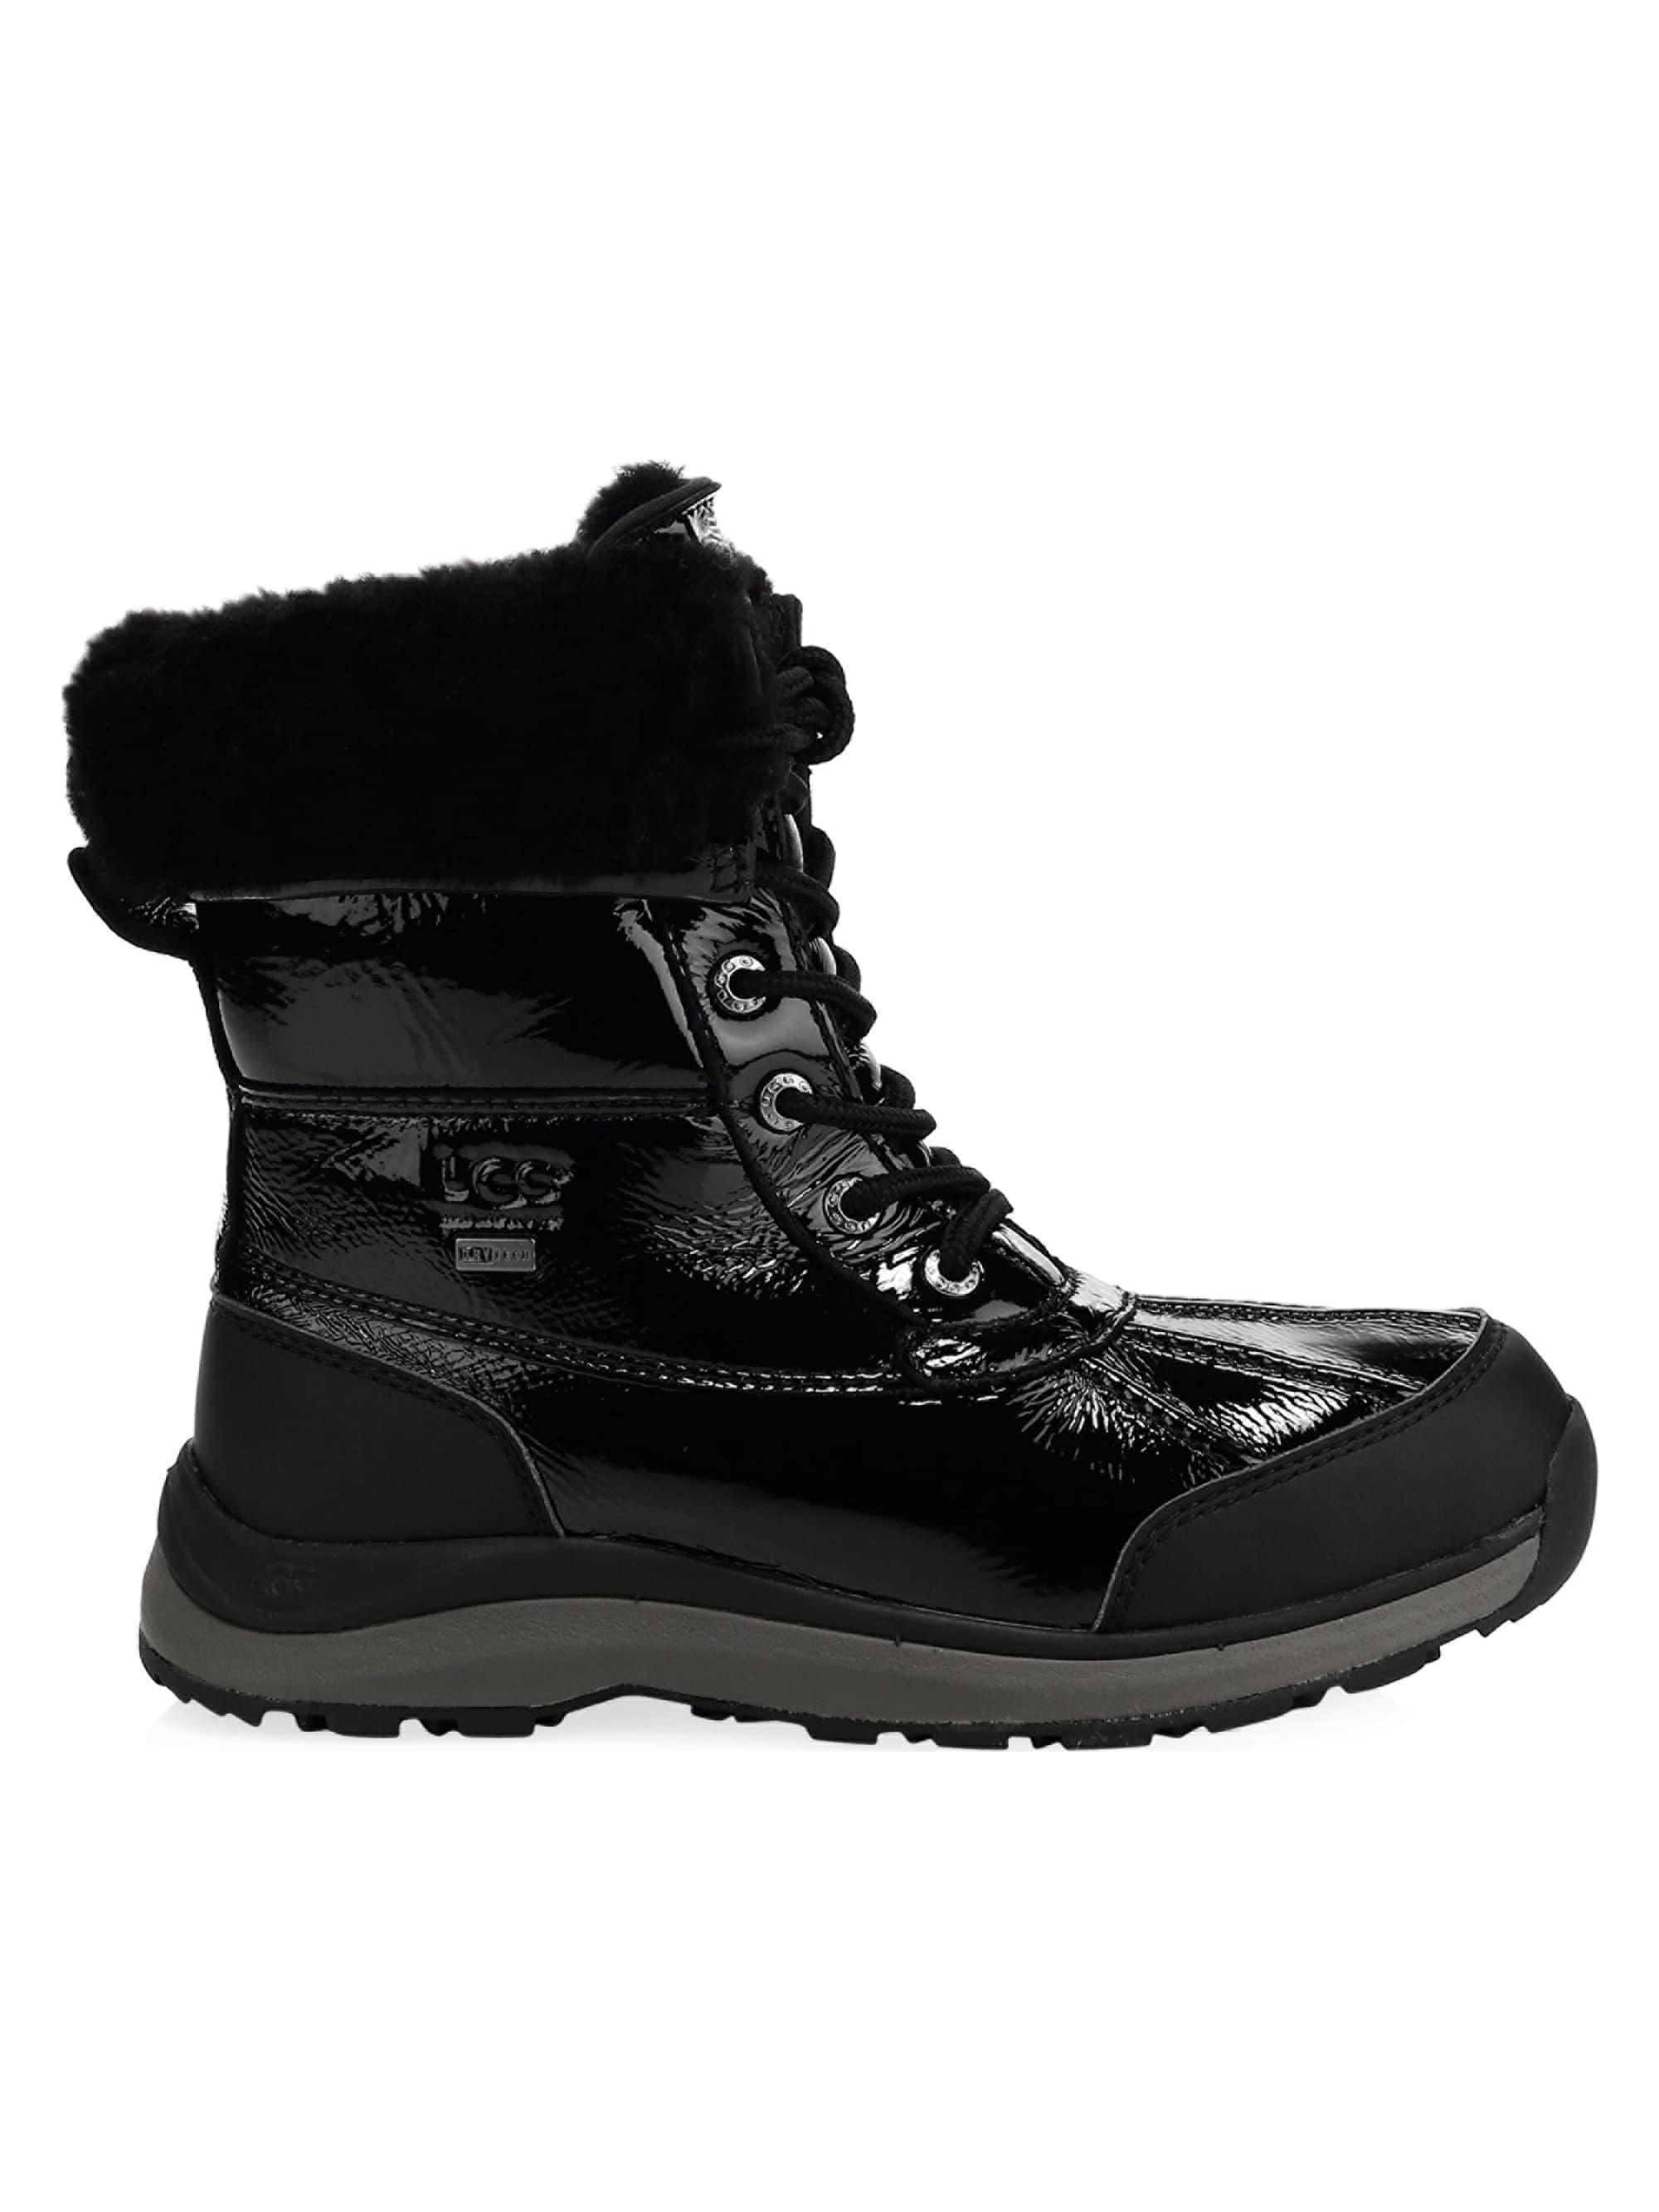 a6844c07e44 Ugg - Black Pure Patent Adirondack Boots - Lyst